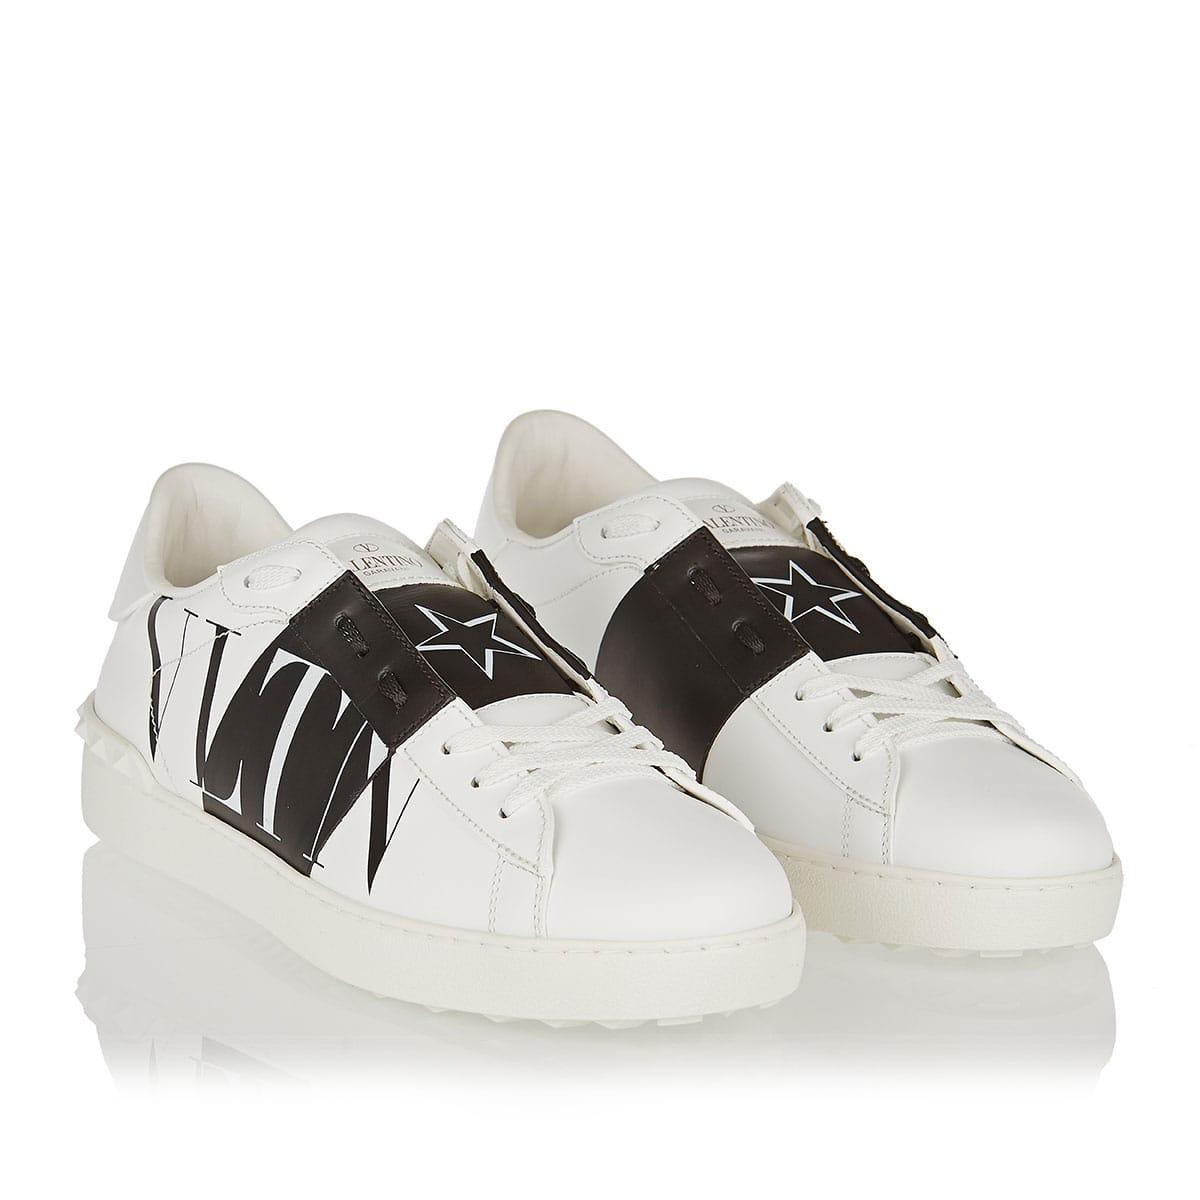 VLTN STAR open leather sneakers